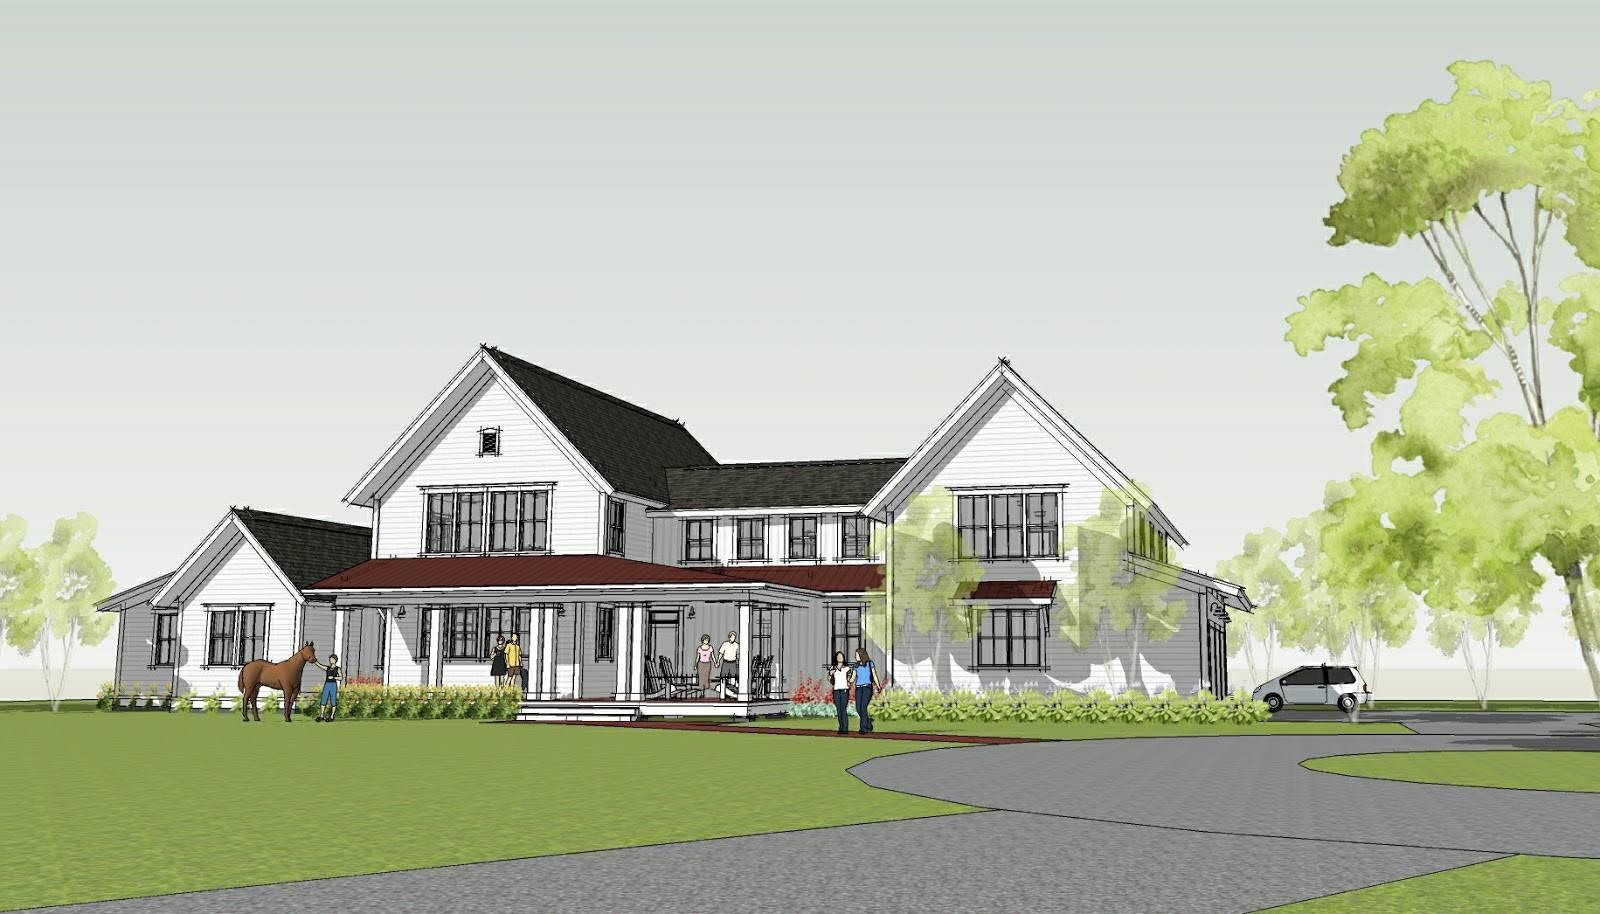 Simply Elegant Home Designs Blog Modern Farmhouse Ron Brenner House Plans 61281